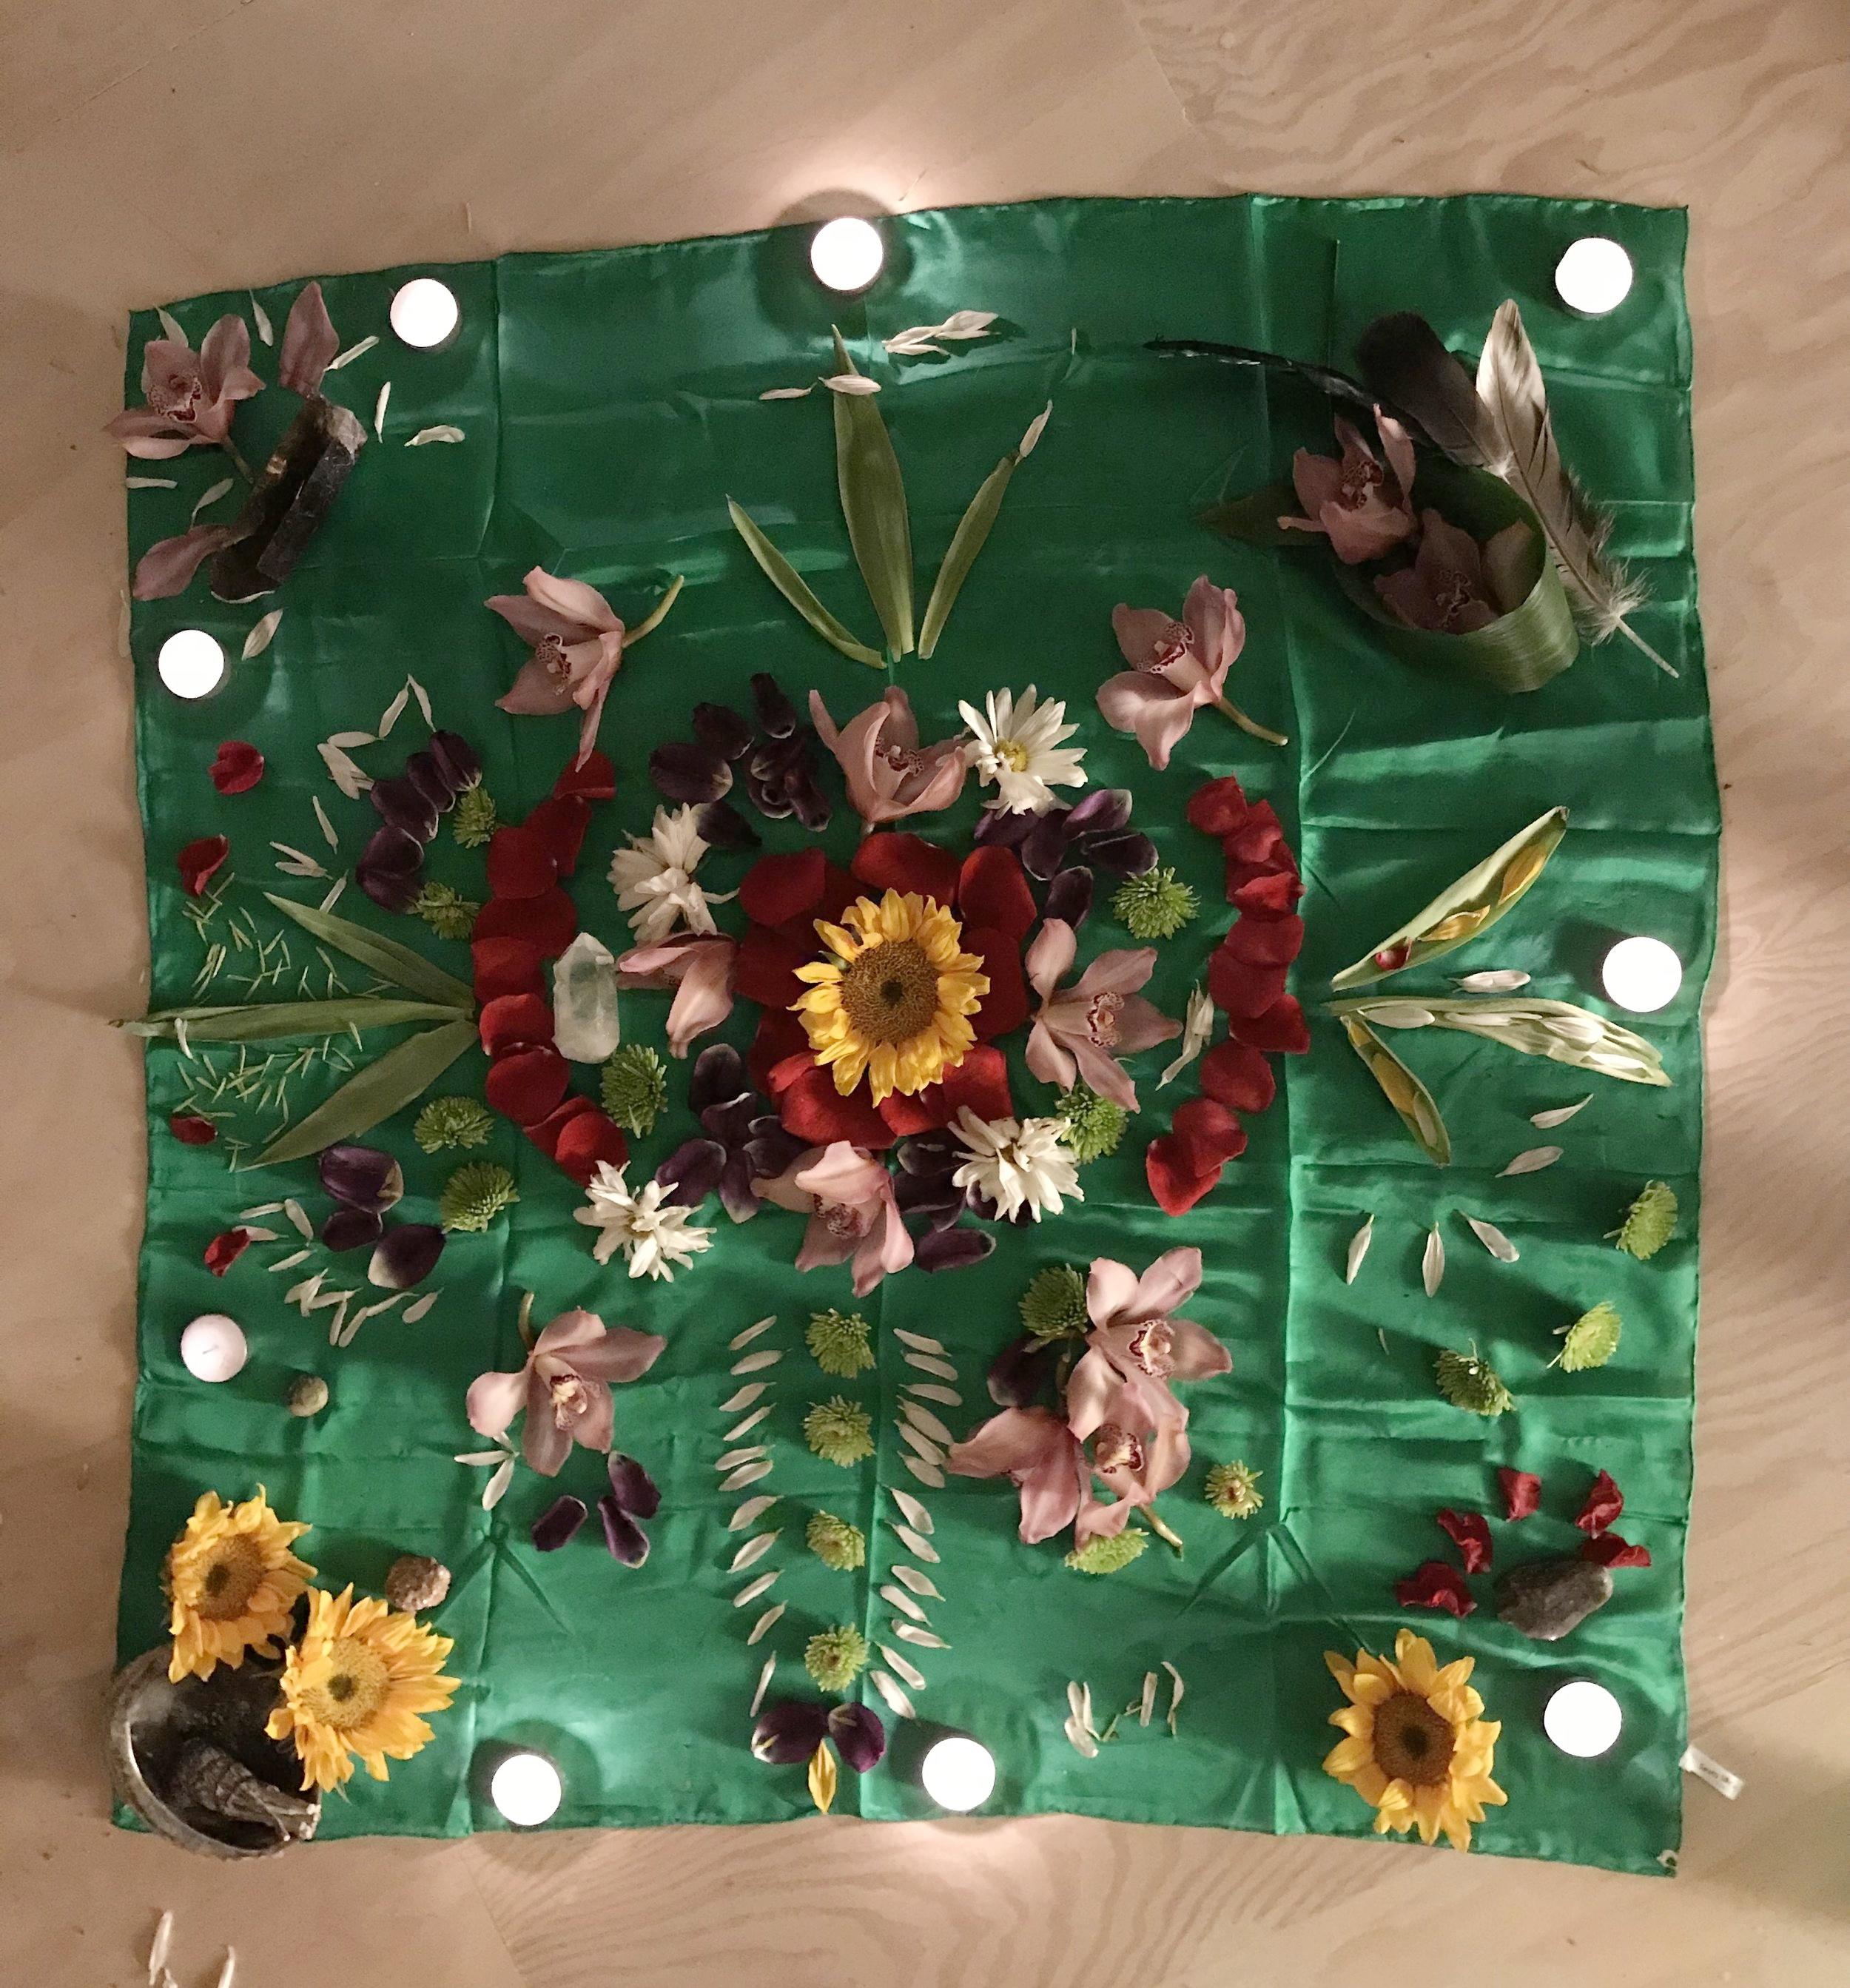 '18 January Capricorn New Moon Circle Flower Mandala